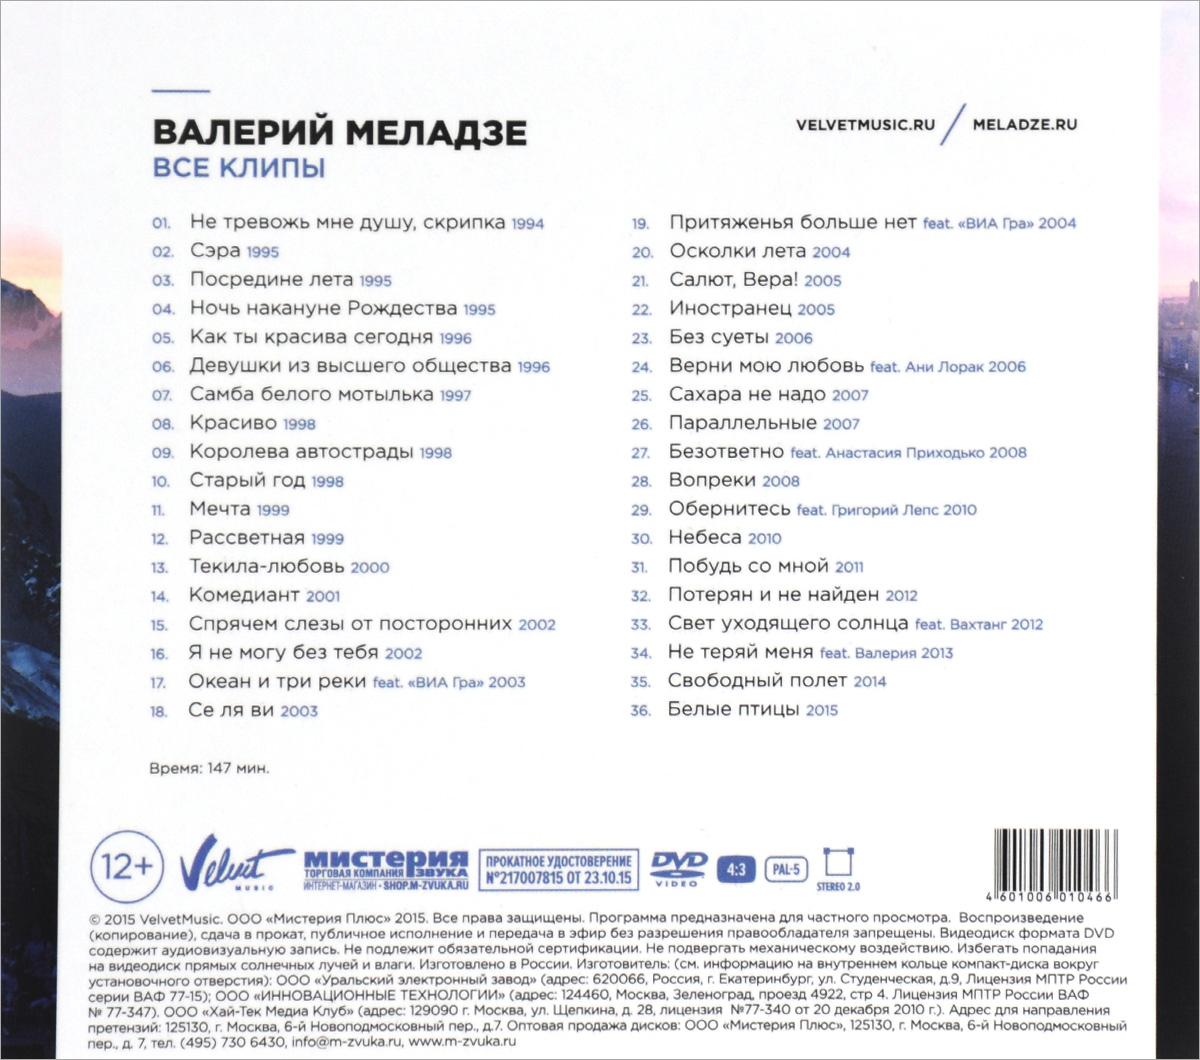 Валерий Меладзе:  Все клипы Velvet Music